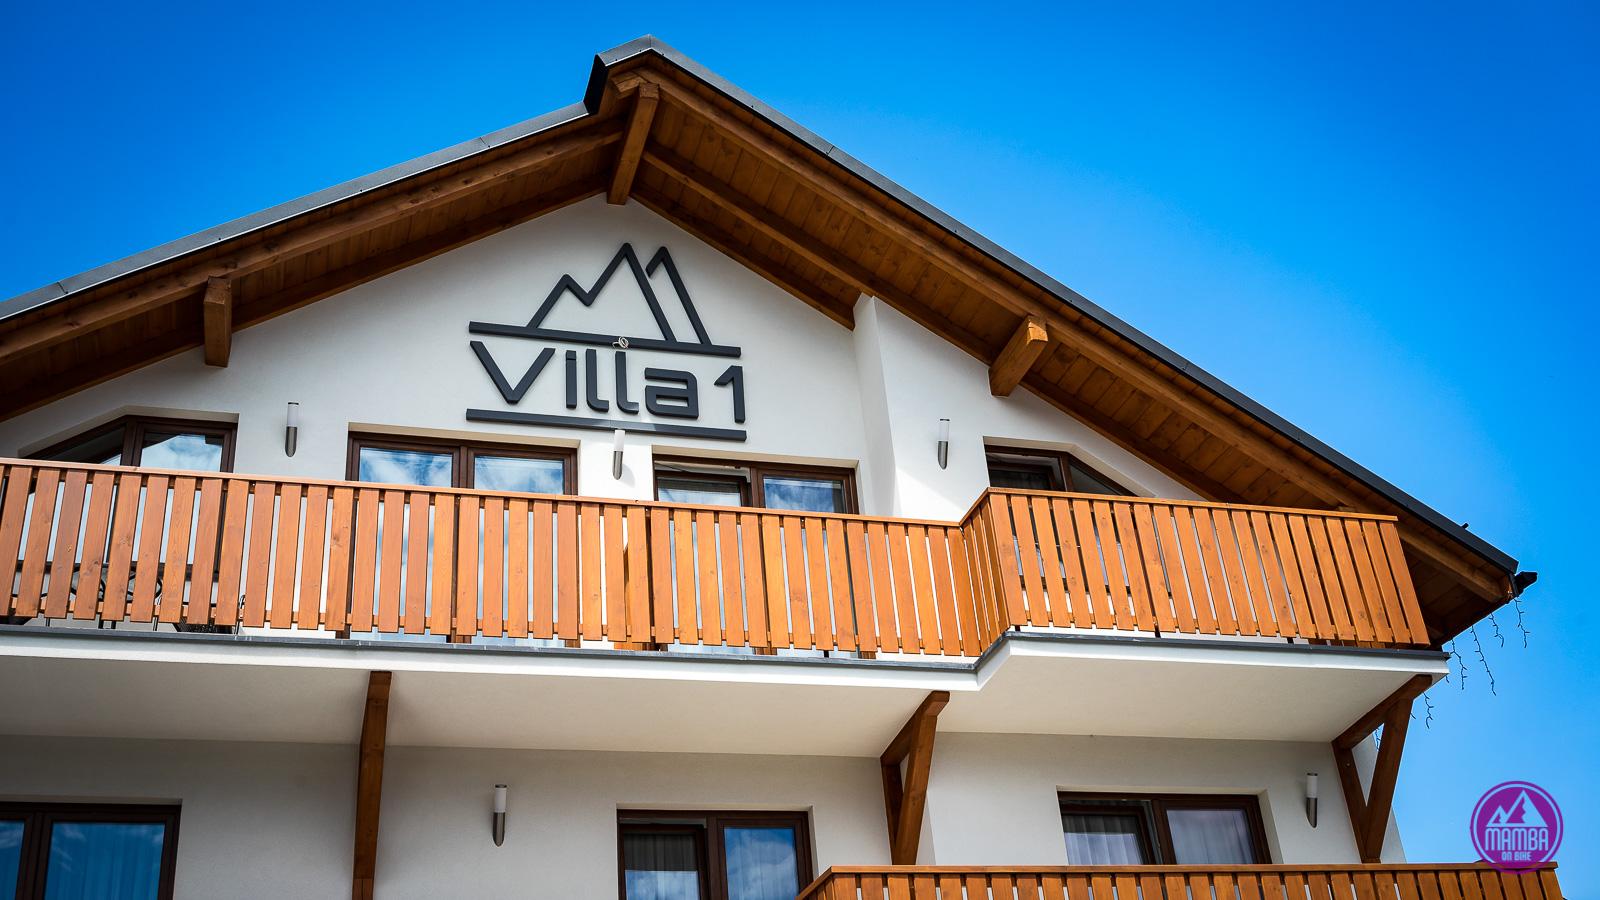 Villa 1 Wisła